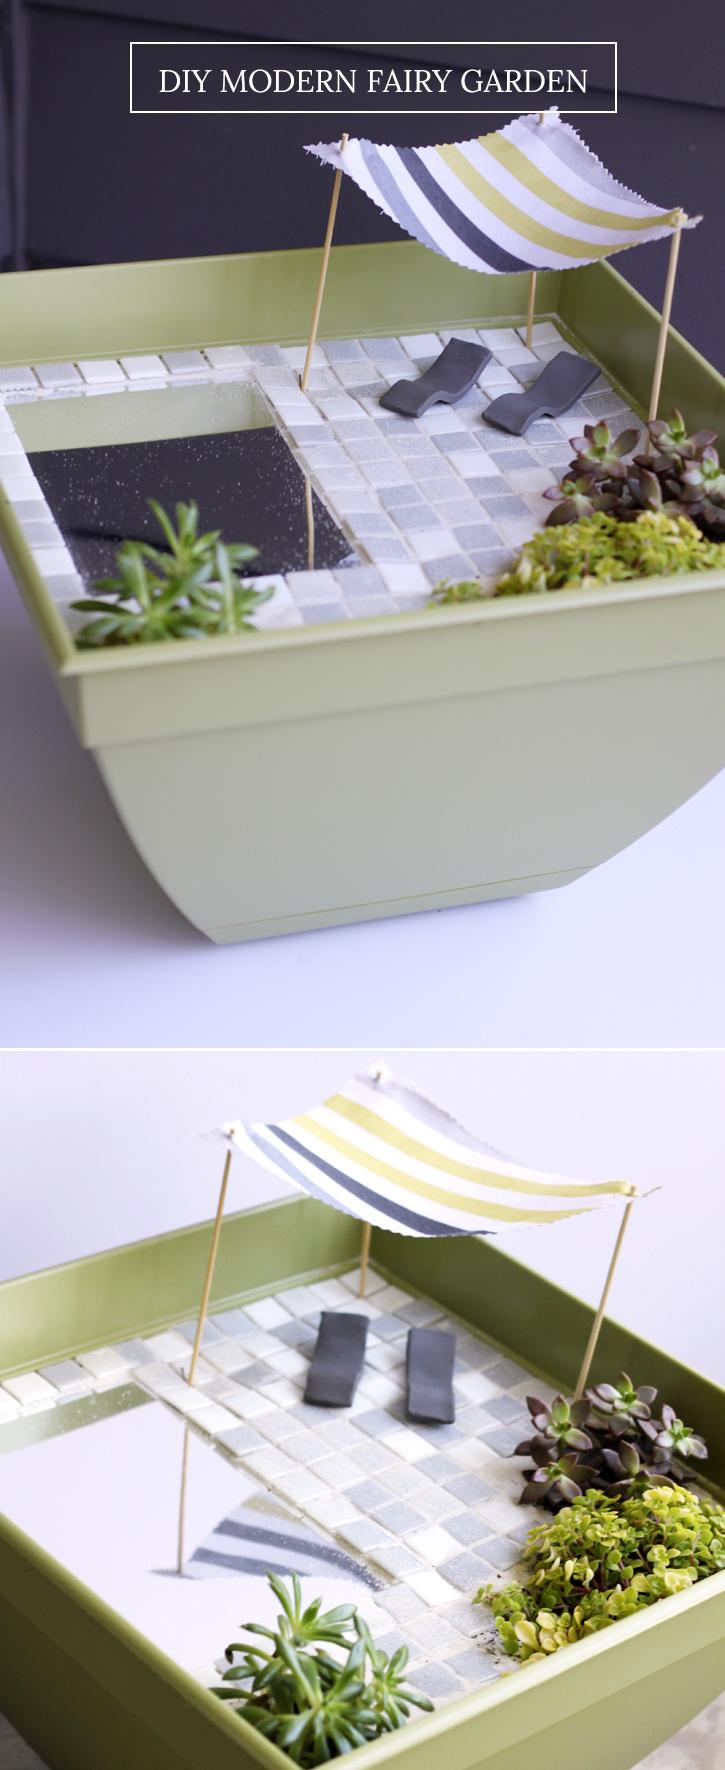 DIY Modern Fairy Garden tutorial - mirror for a pond!